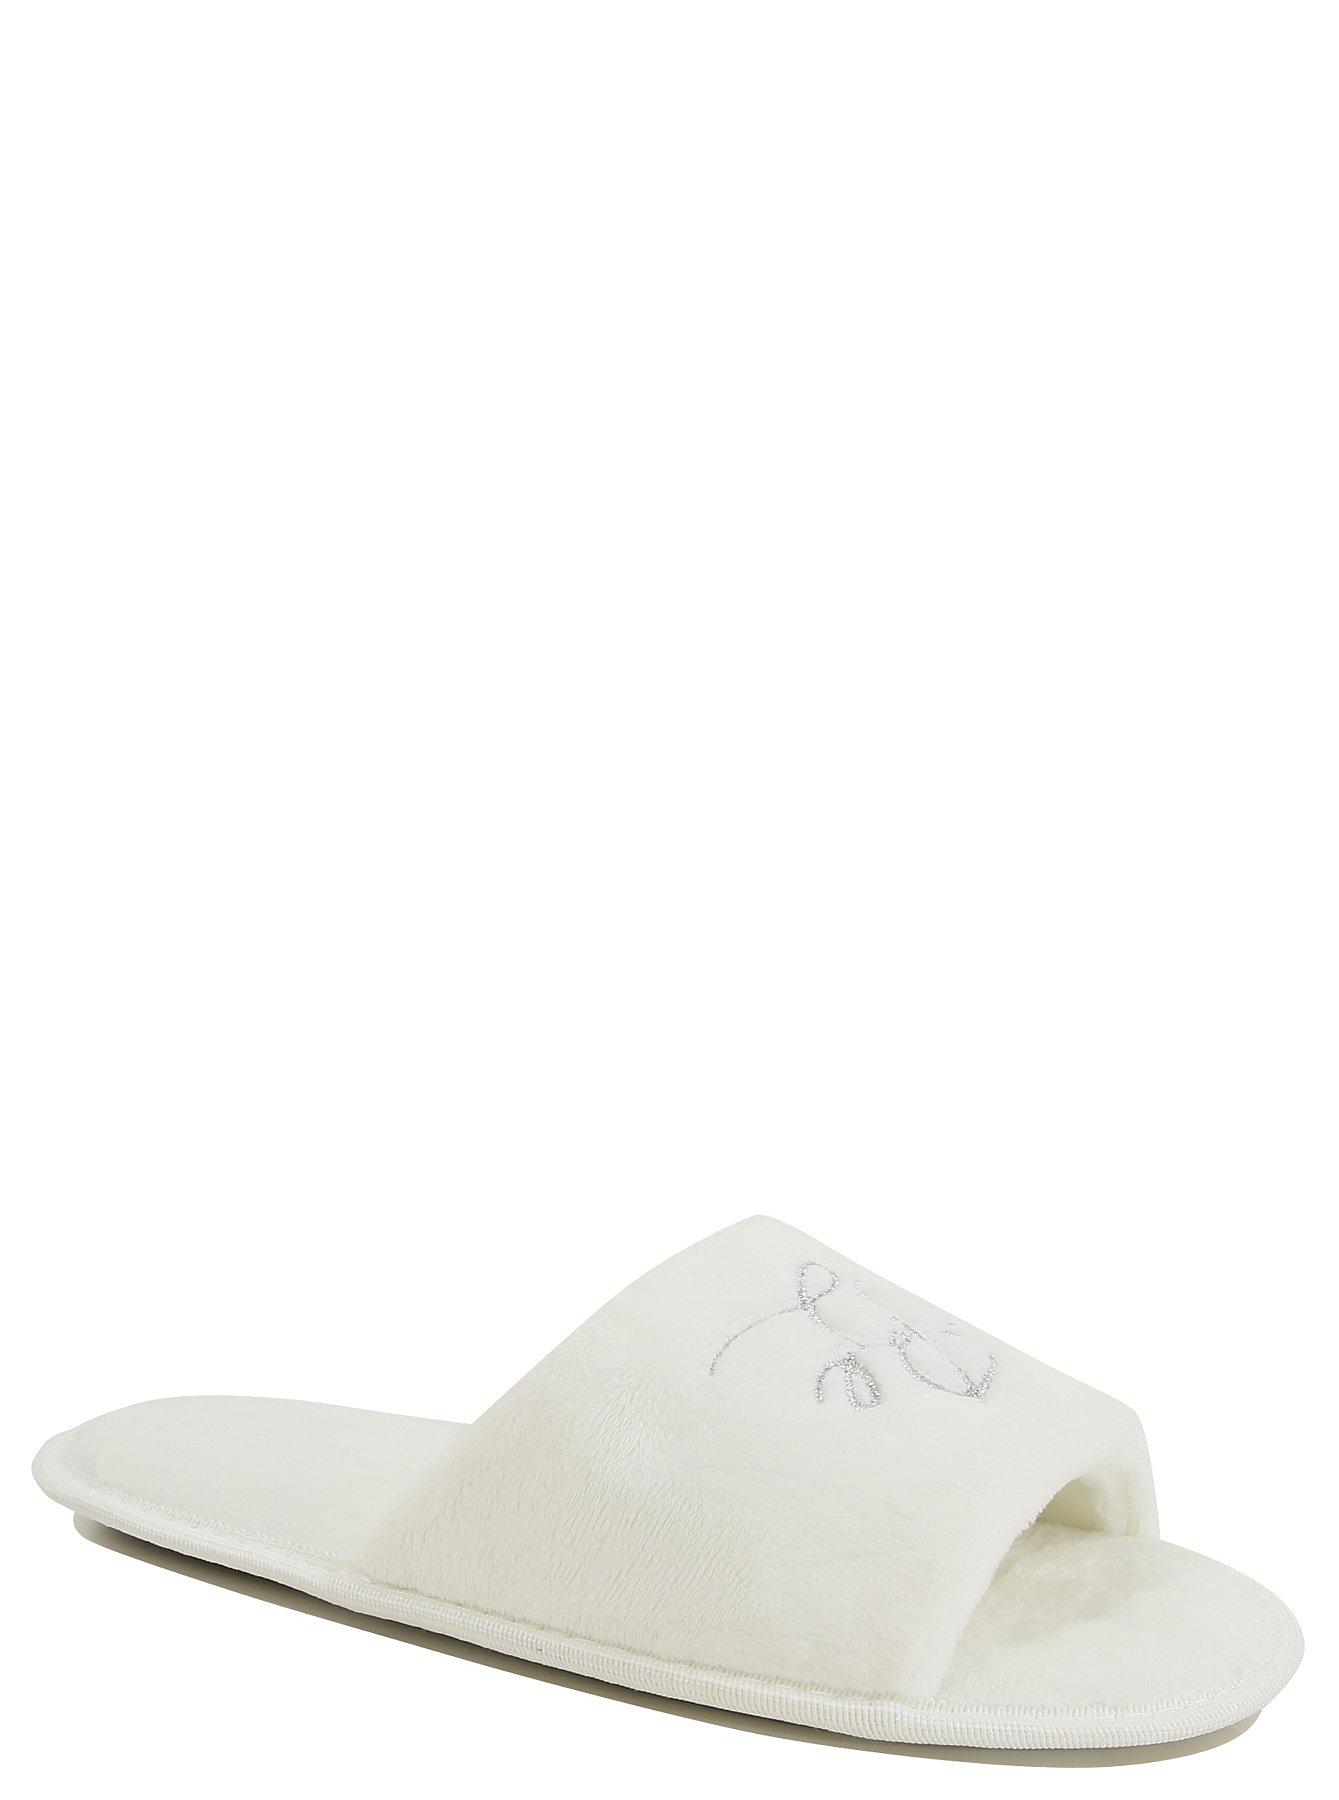 Black sandals asda - Black Sandals Asda 32